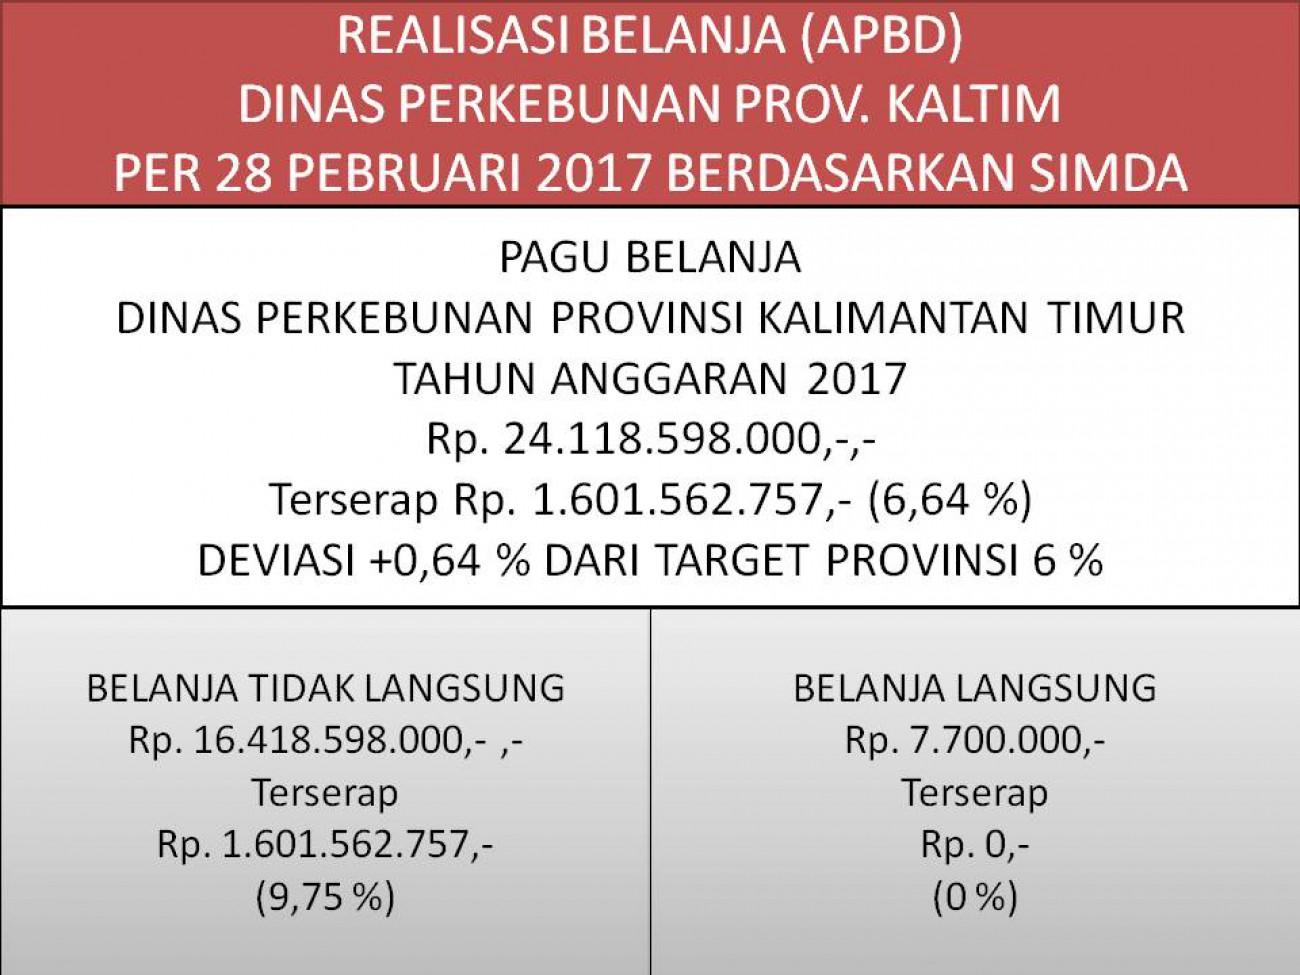 Laporan Realisasi APBD Dinas Perkebunan Prov. Kaltim Bulan Pebruari 2017